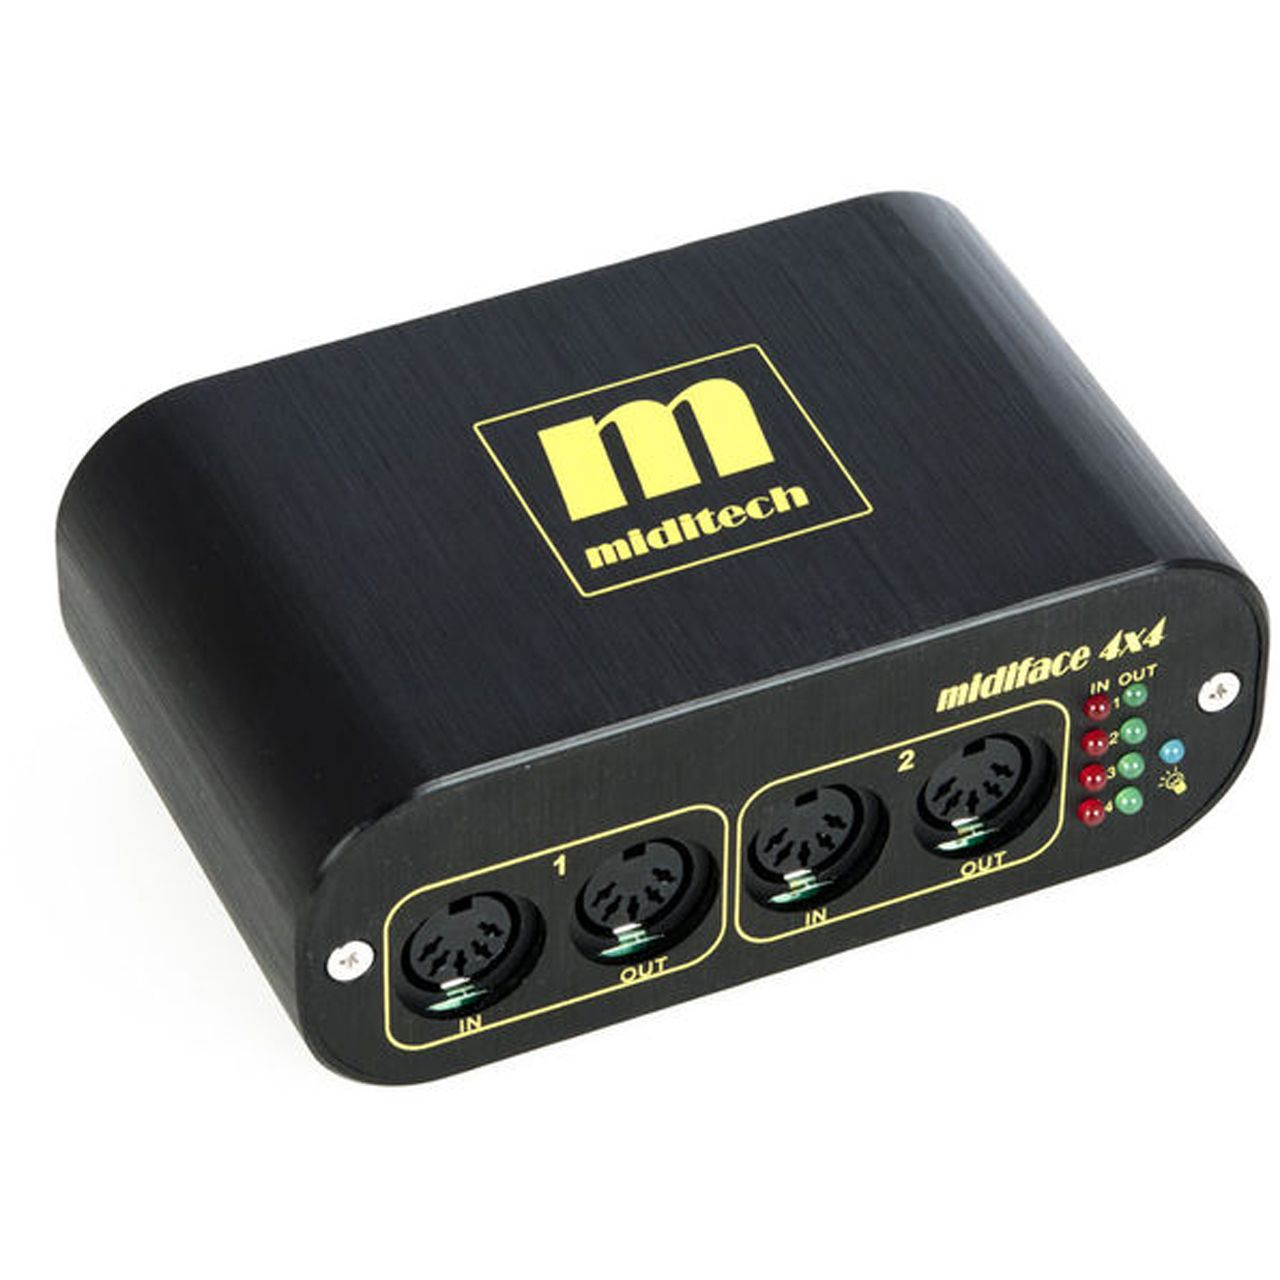 miditech midi interface midiface 4x4 hardware notebooks. Black Bedroom Furniture Sets. Home Design Ideas